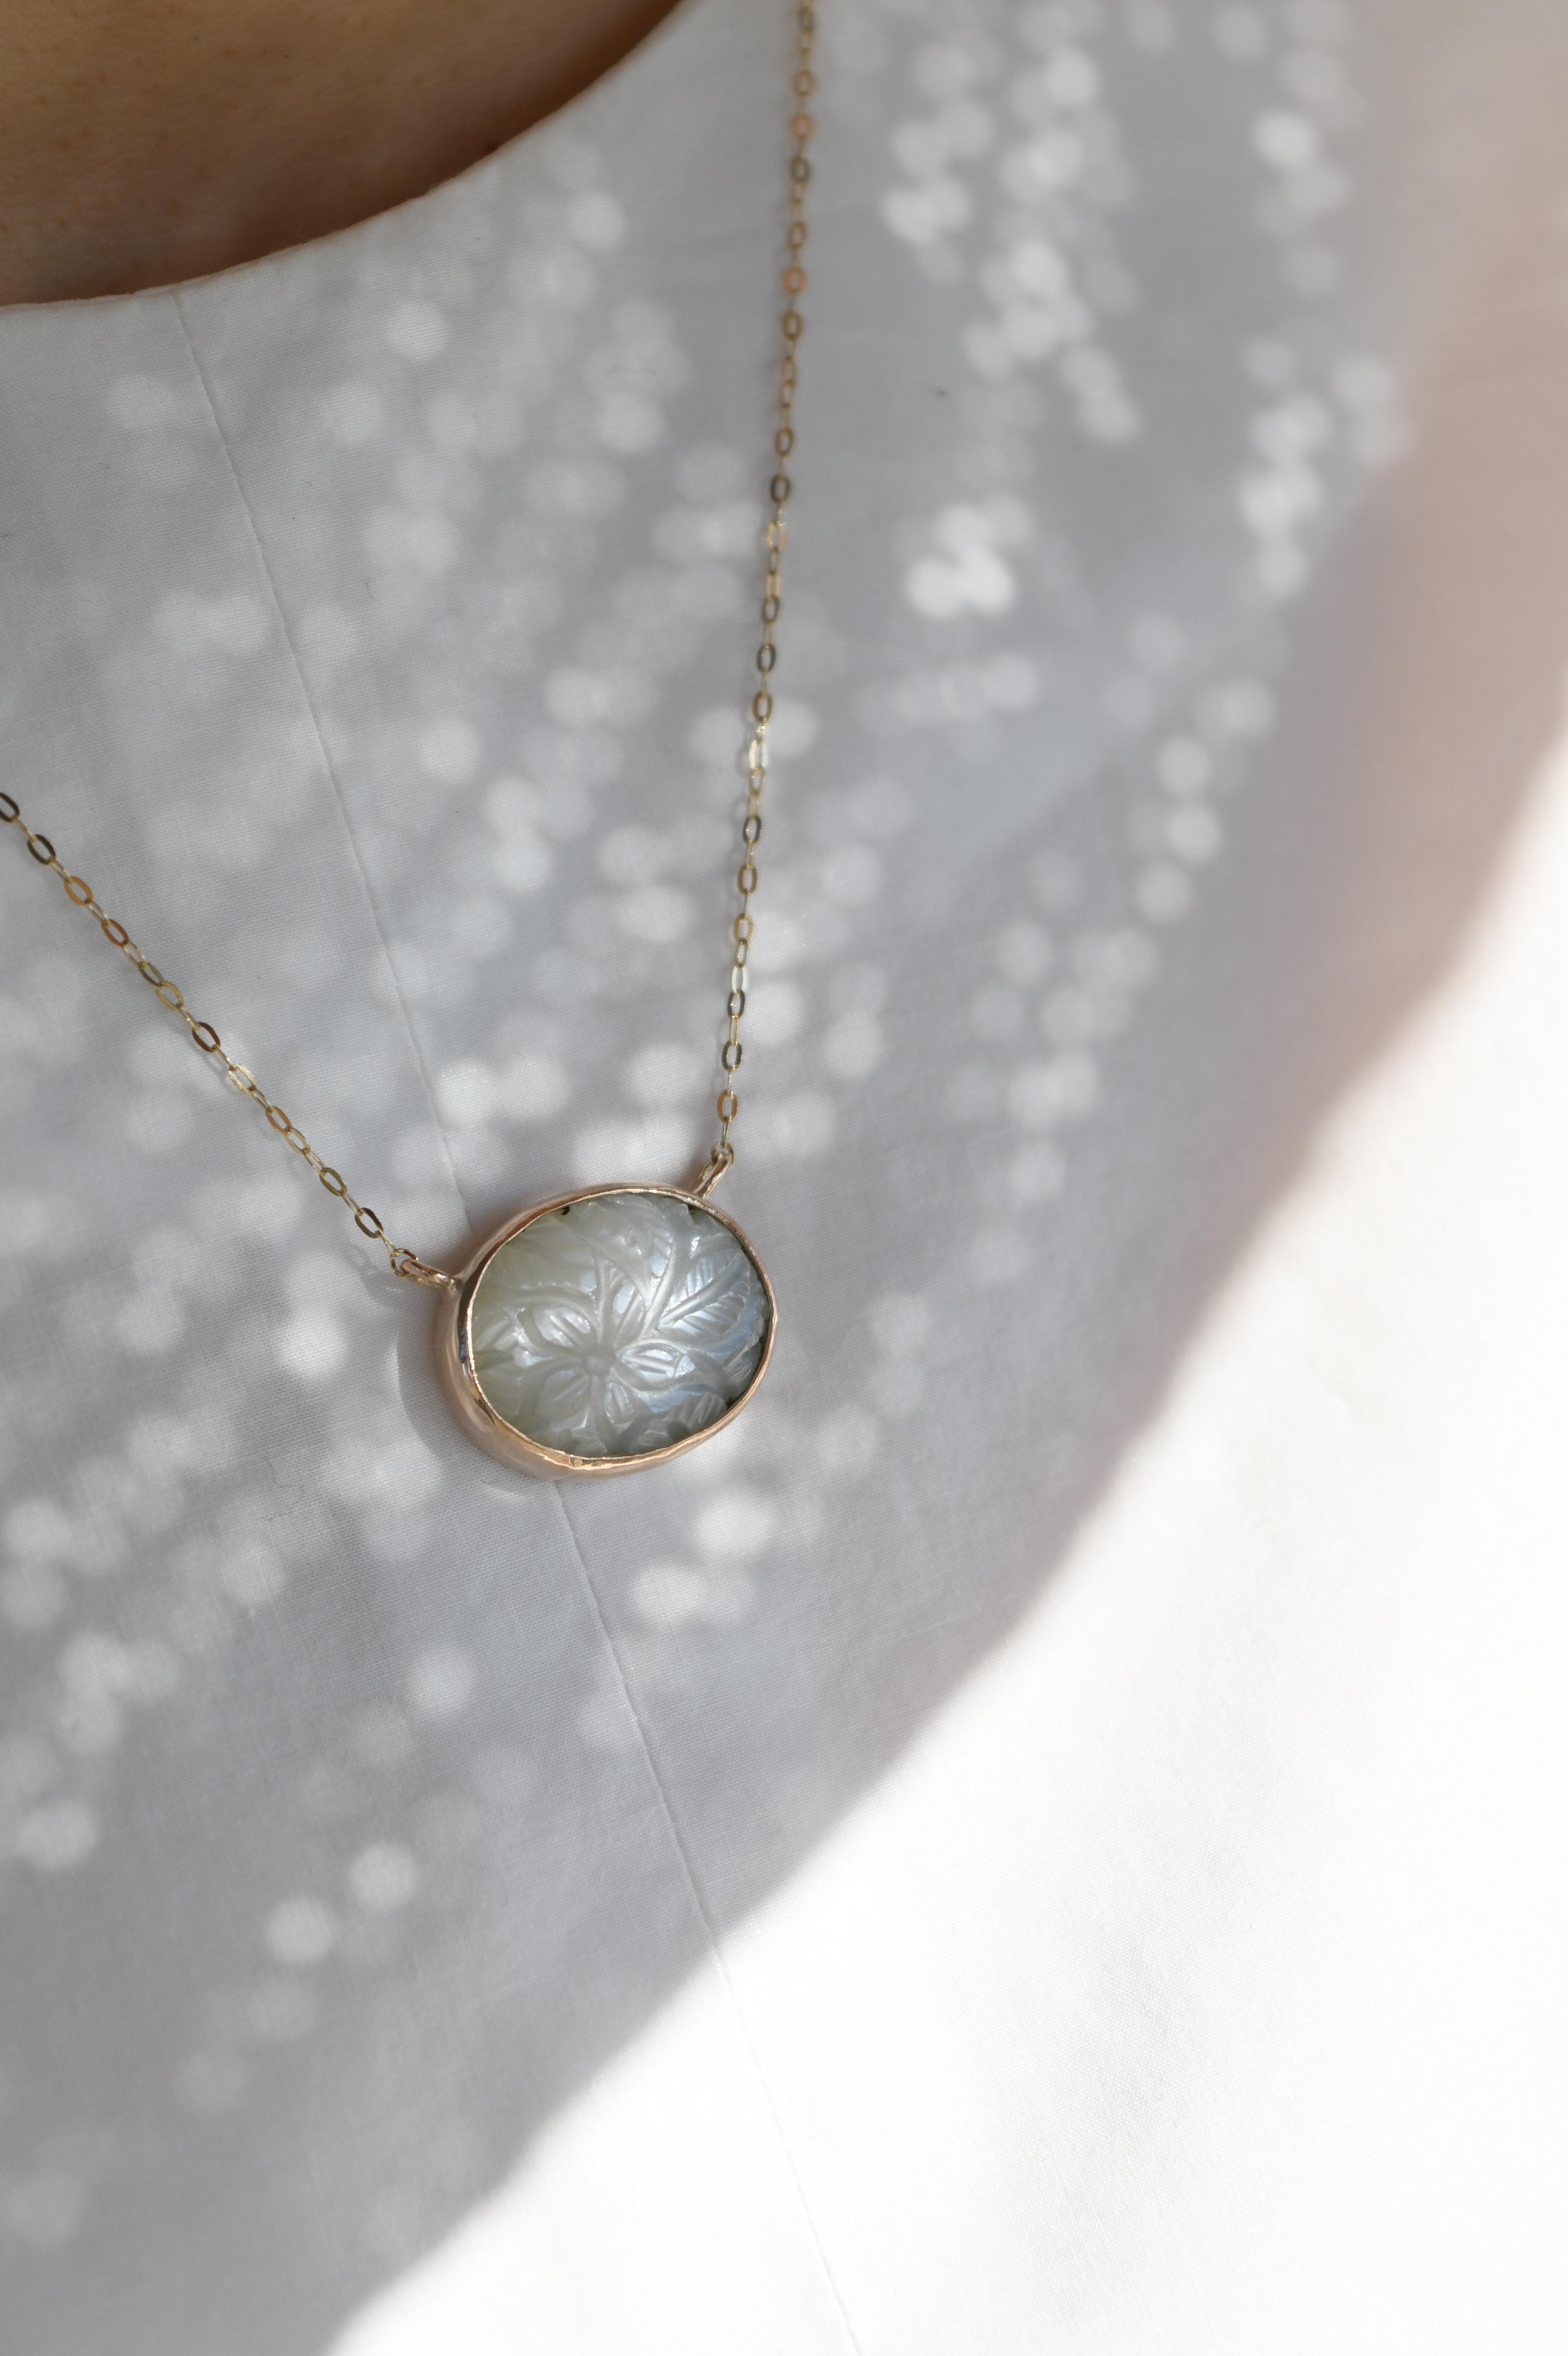 K10 Carving Moonstone Necklace 10金カービングムーンストーンネックレス